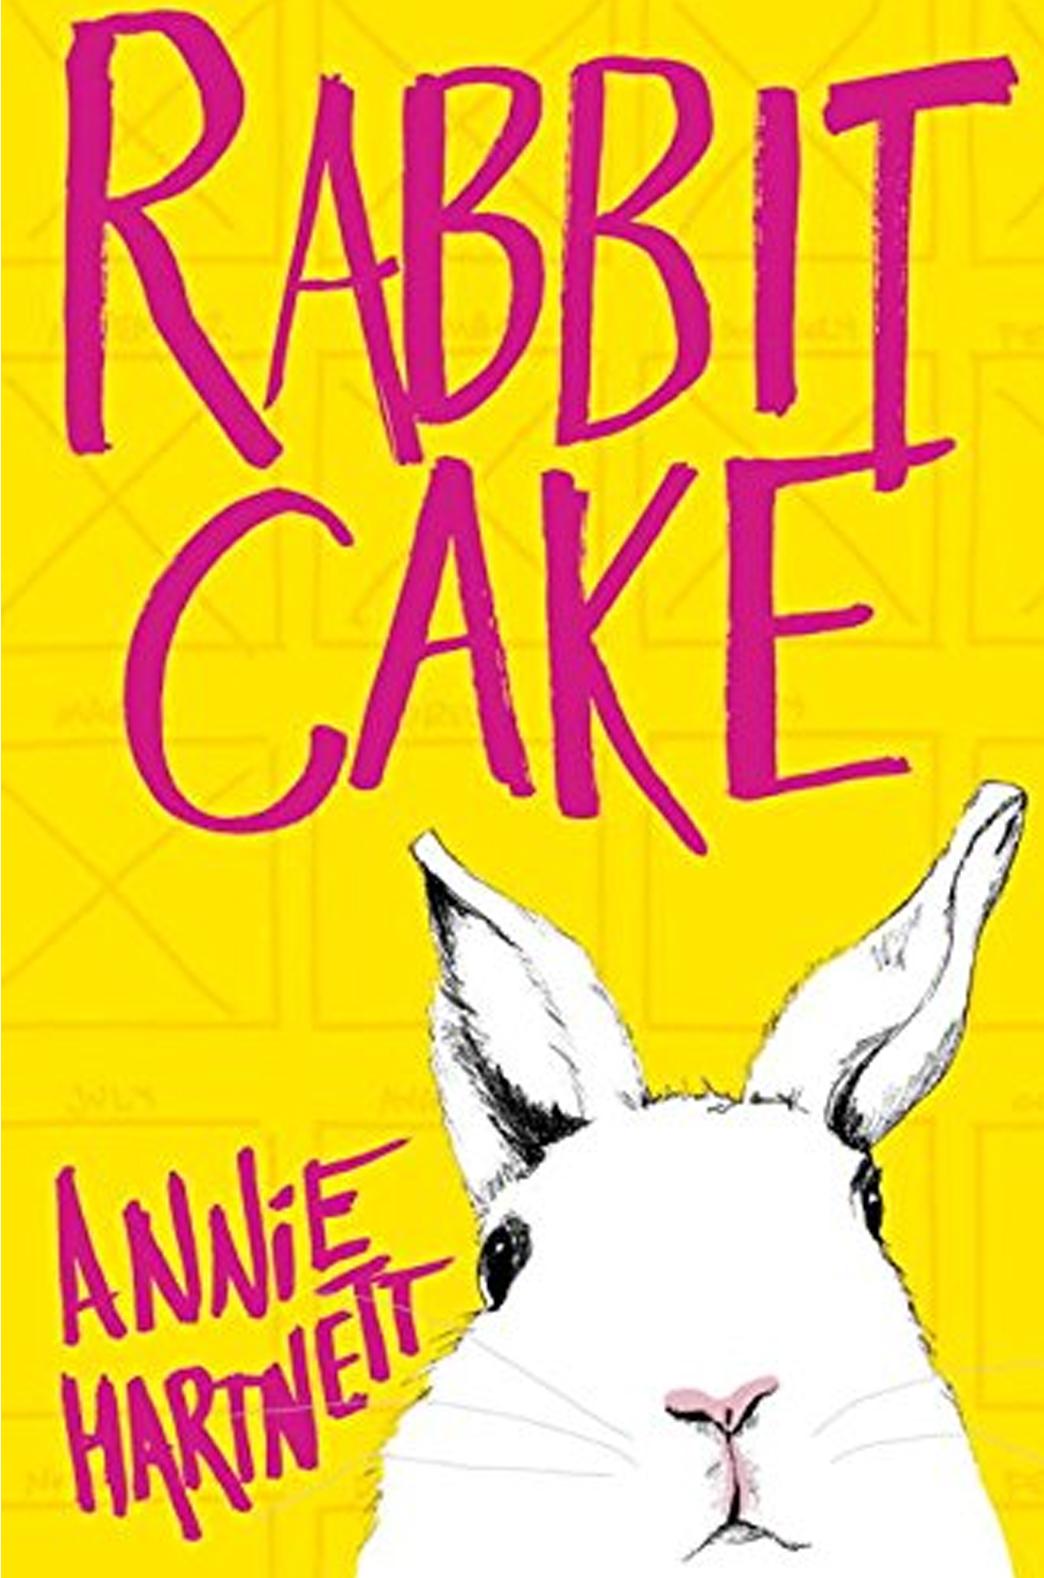 kathleen stone writer booklab literary salon rabbit cake annie hartnett